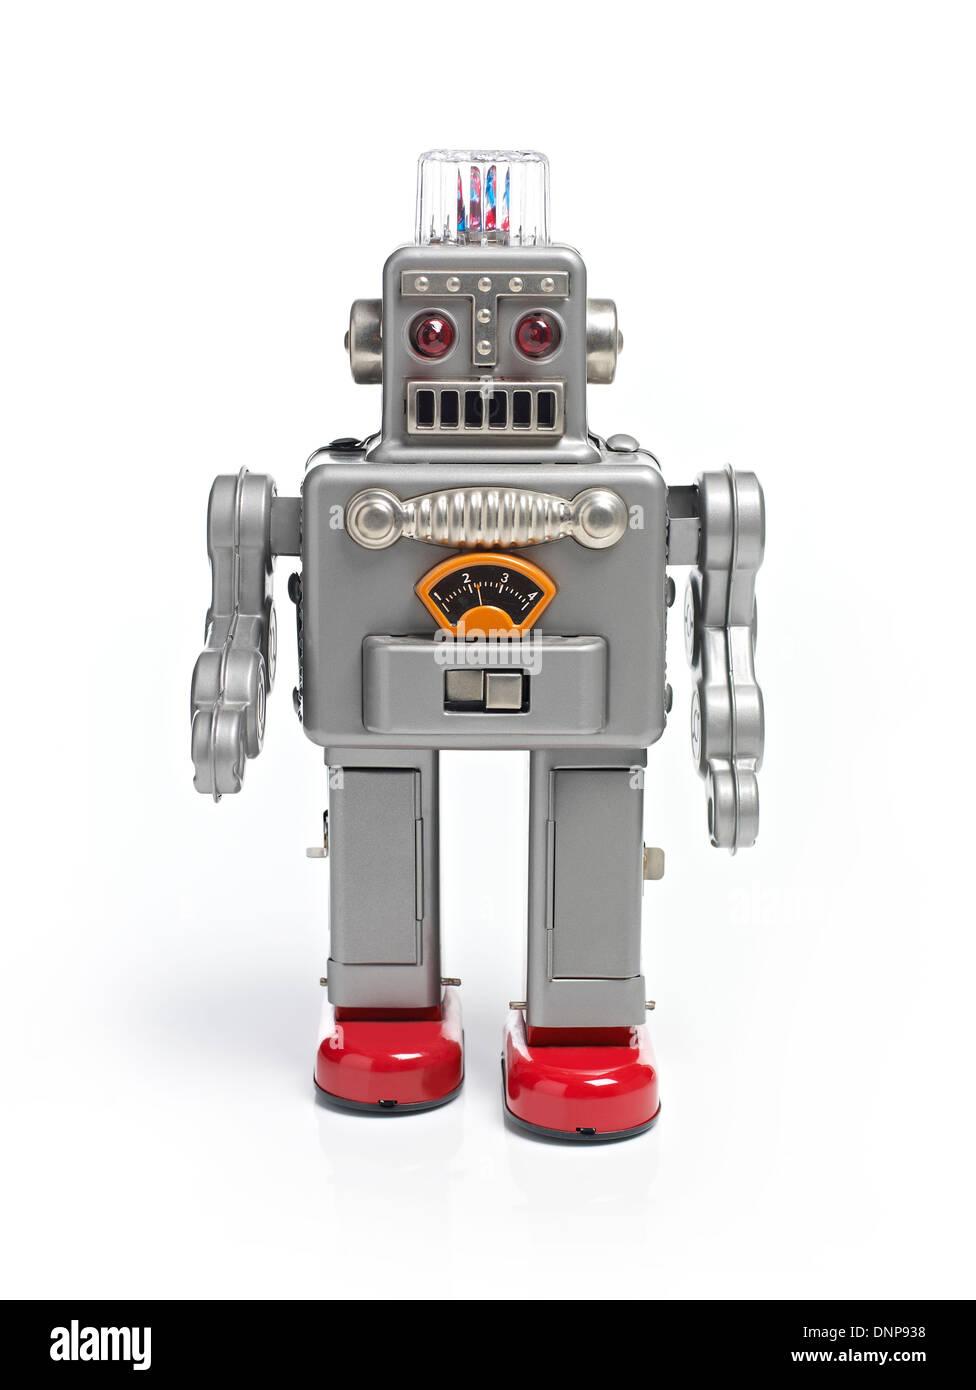 Fuß retro Spielzeugroboter Stockbild